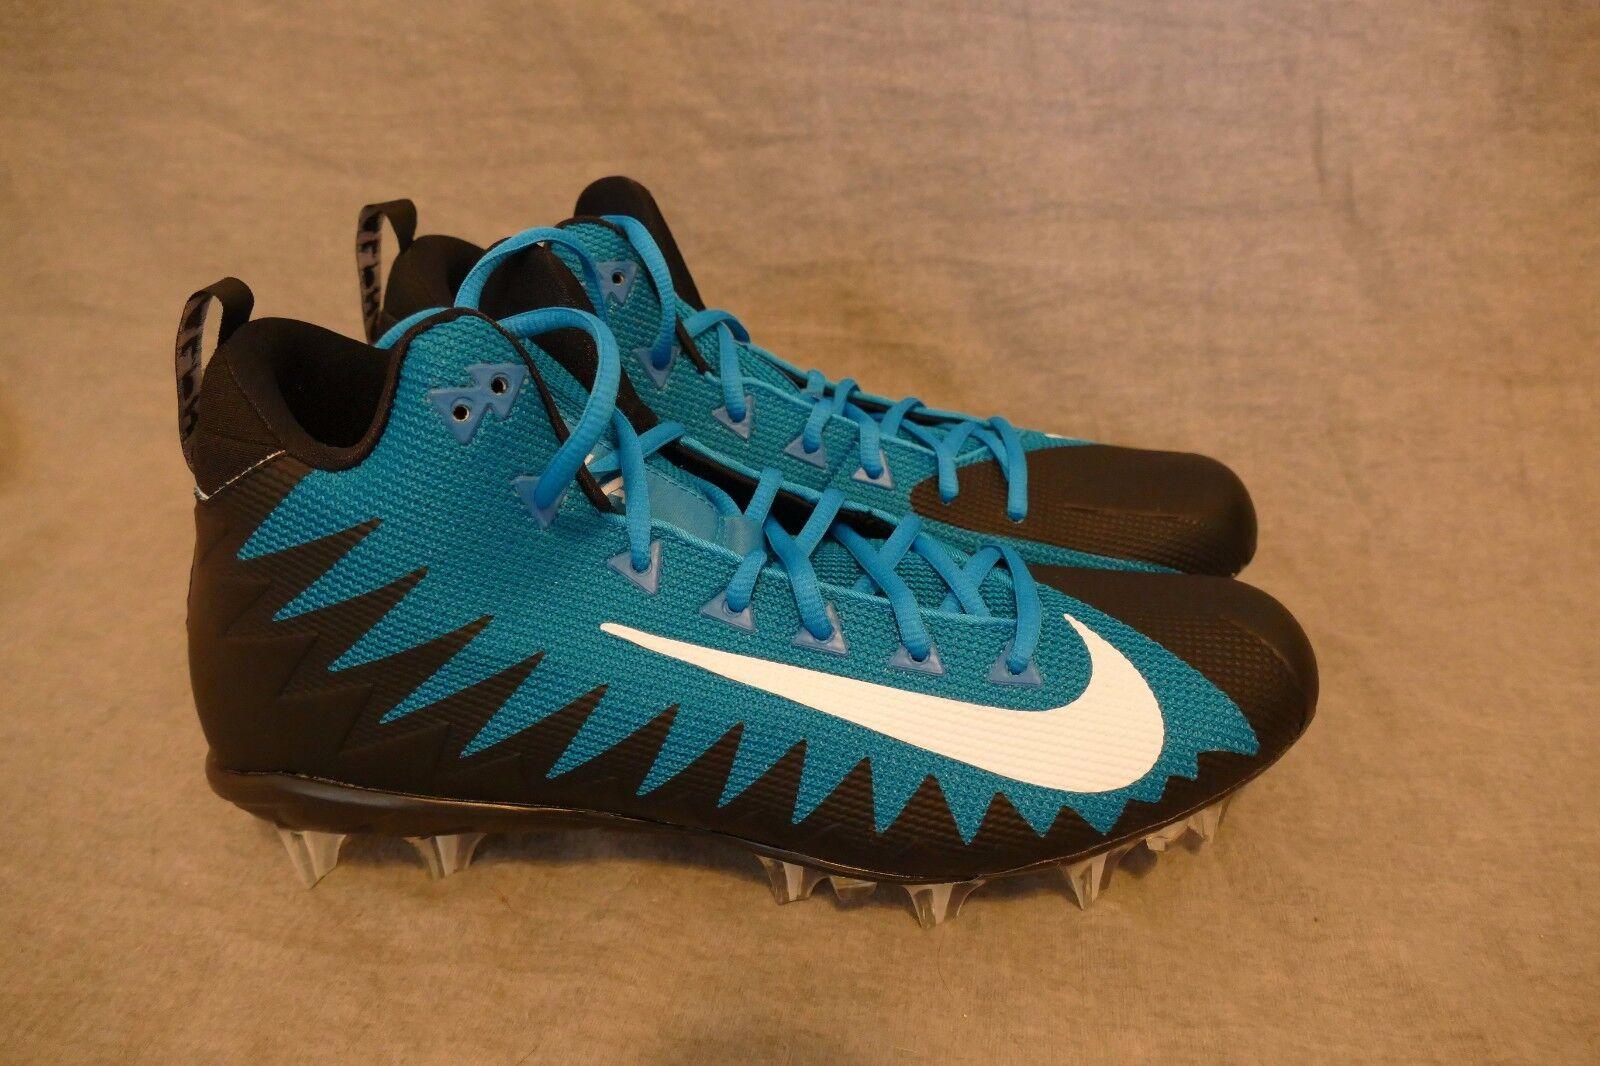 NEW NIKE ALPHA MENACE PRO MID NFL MEN'S FOOTBALL CLEATS 866012 405 Size 12.5